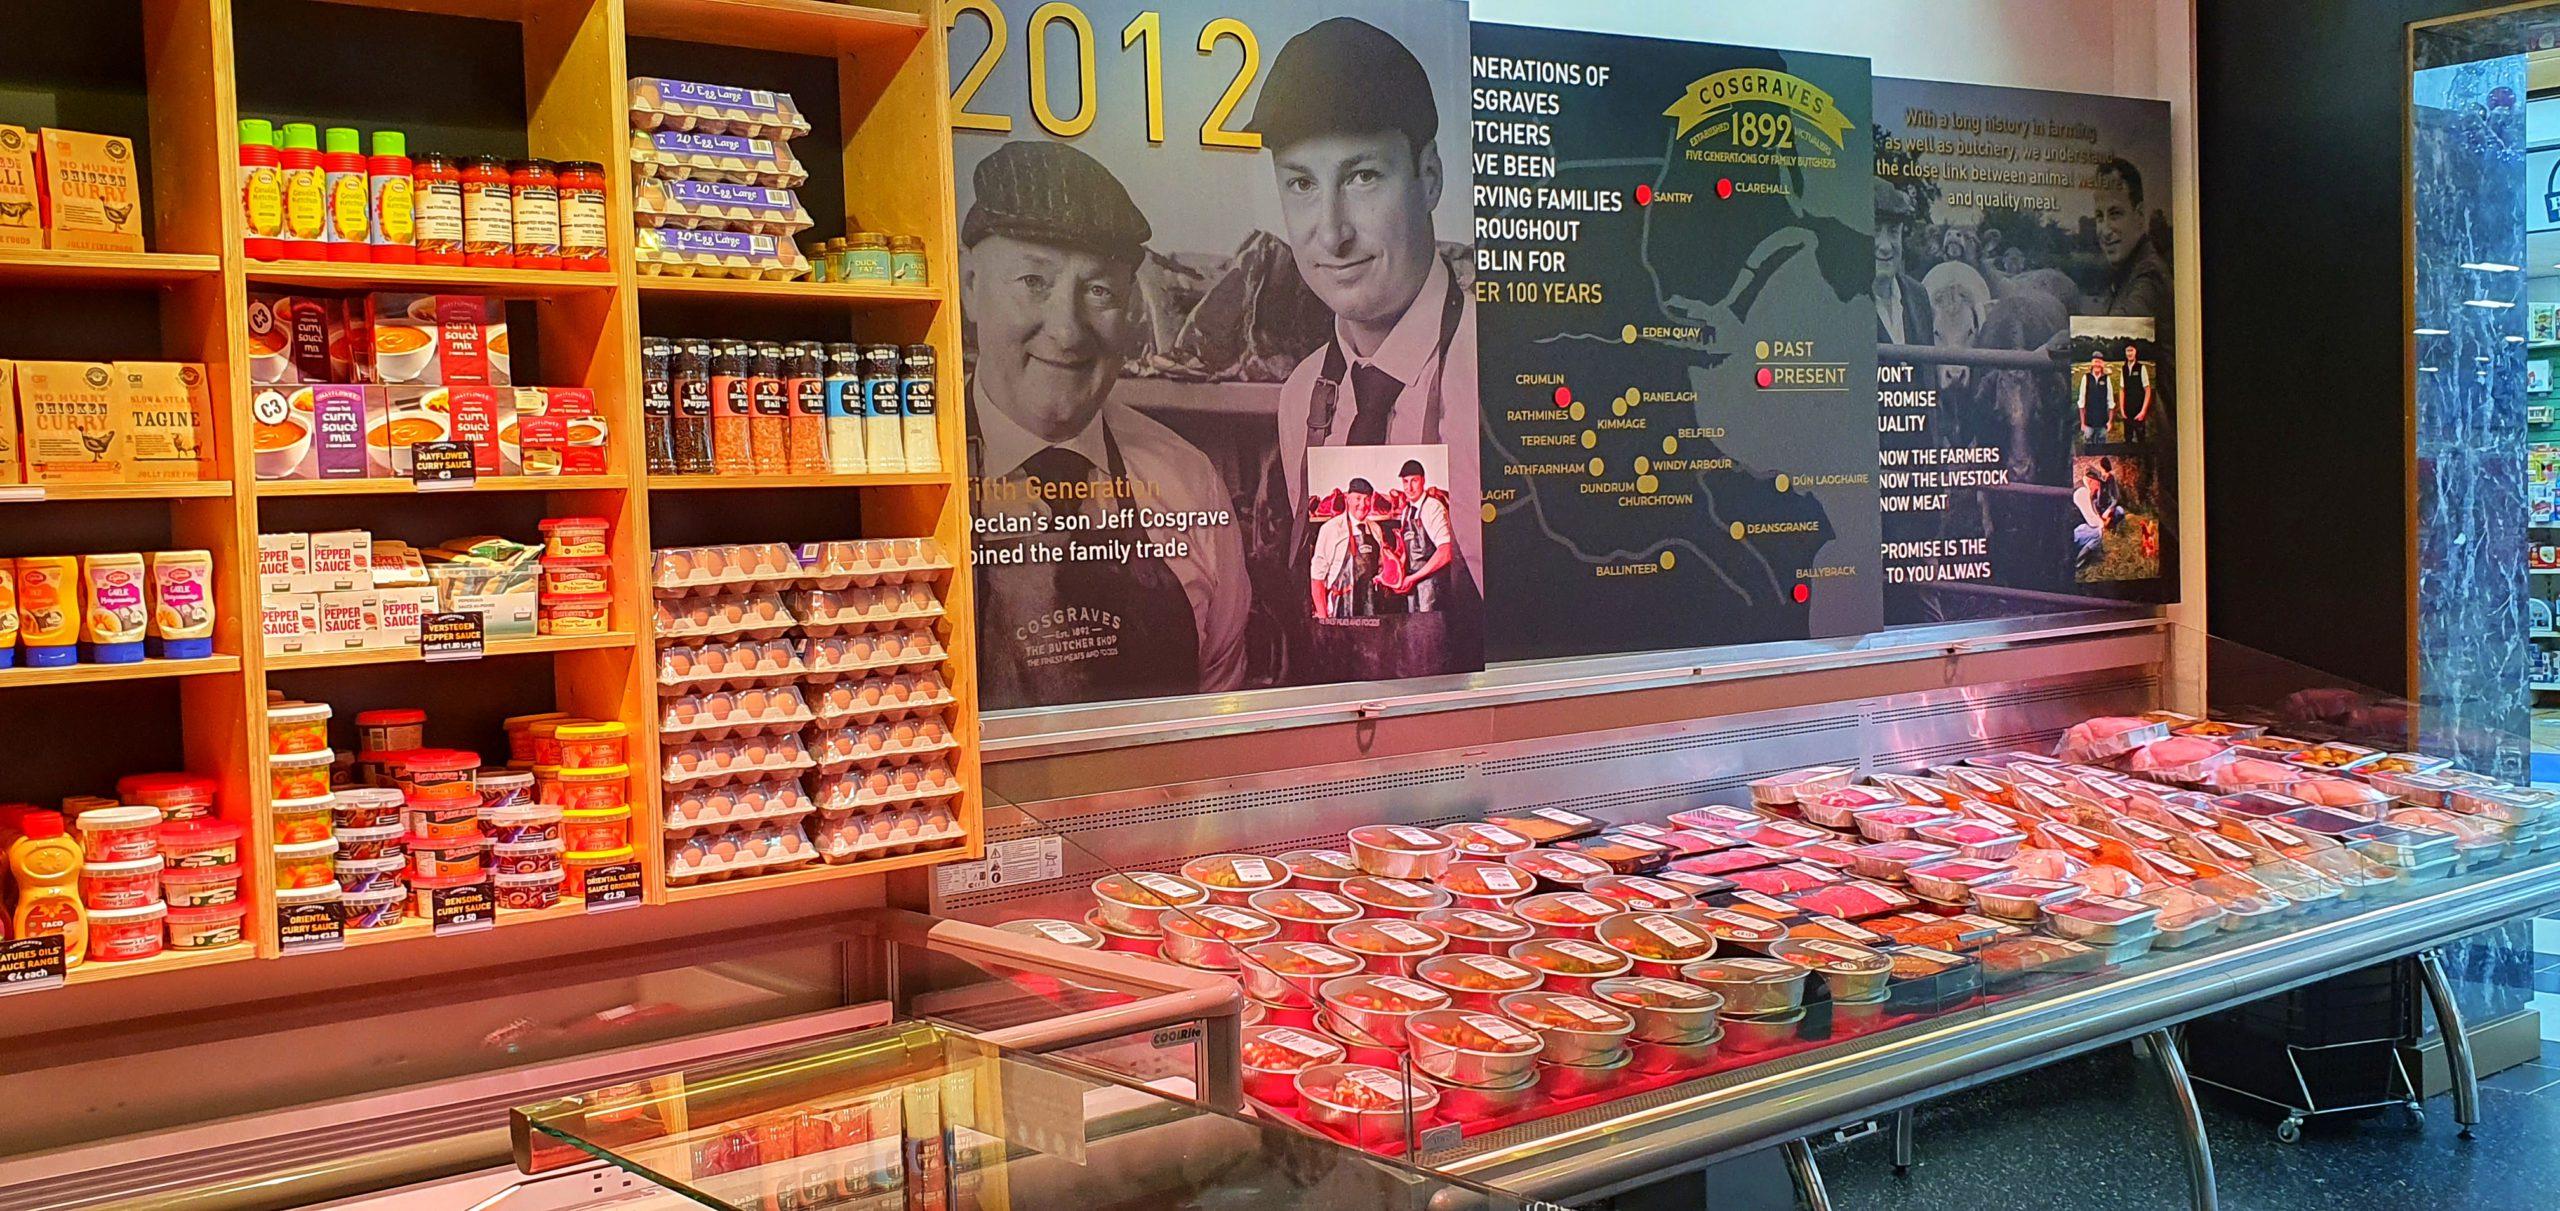 butcher shop, farming news, beef for sale,